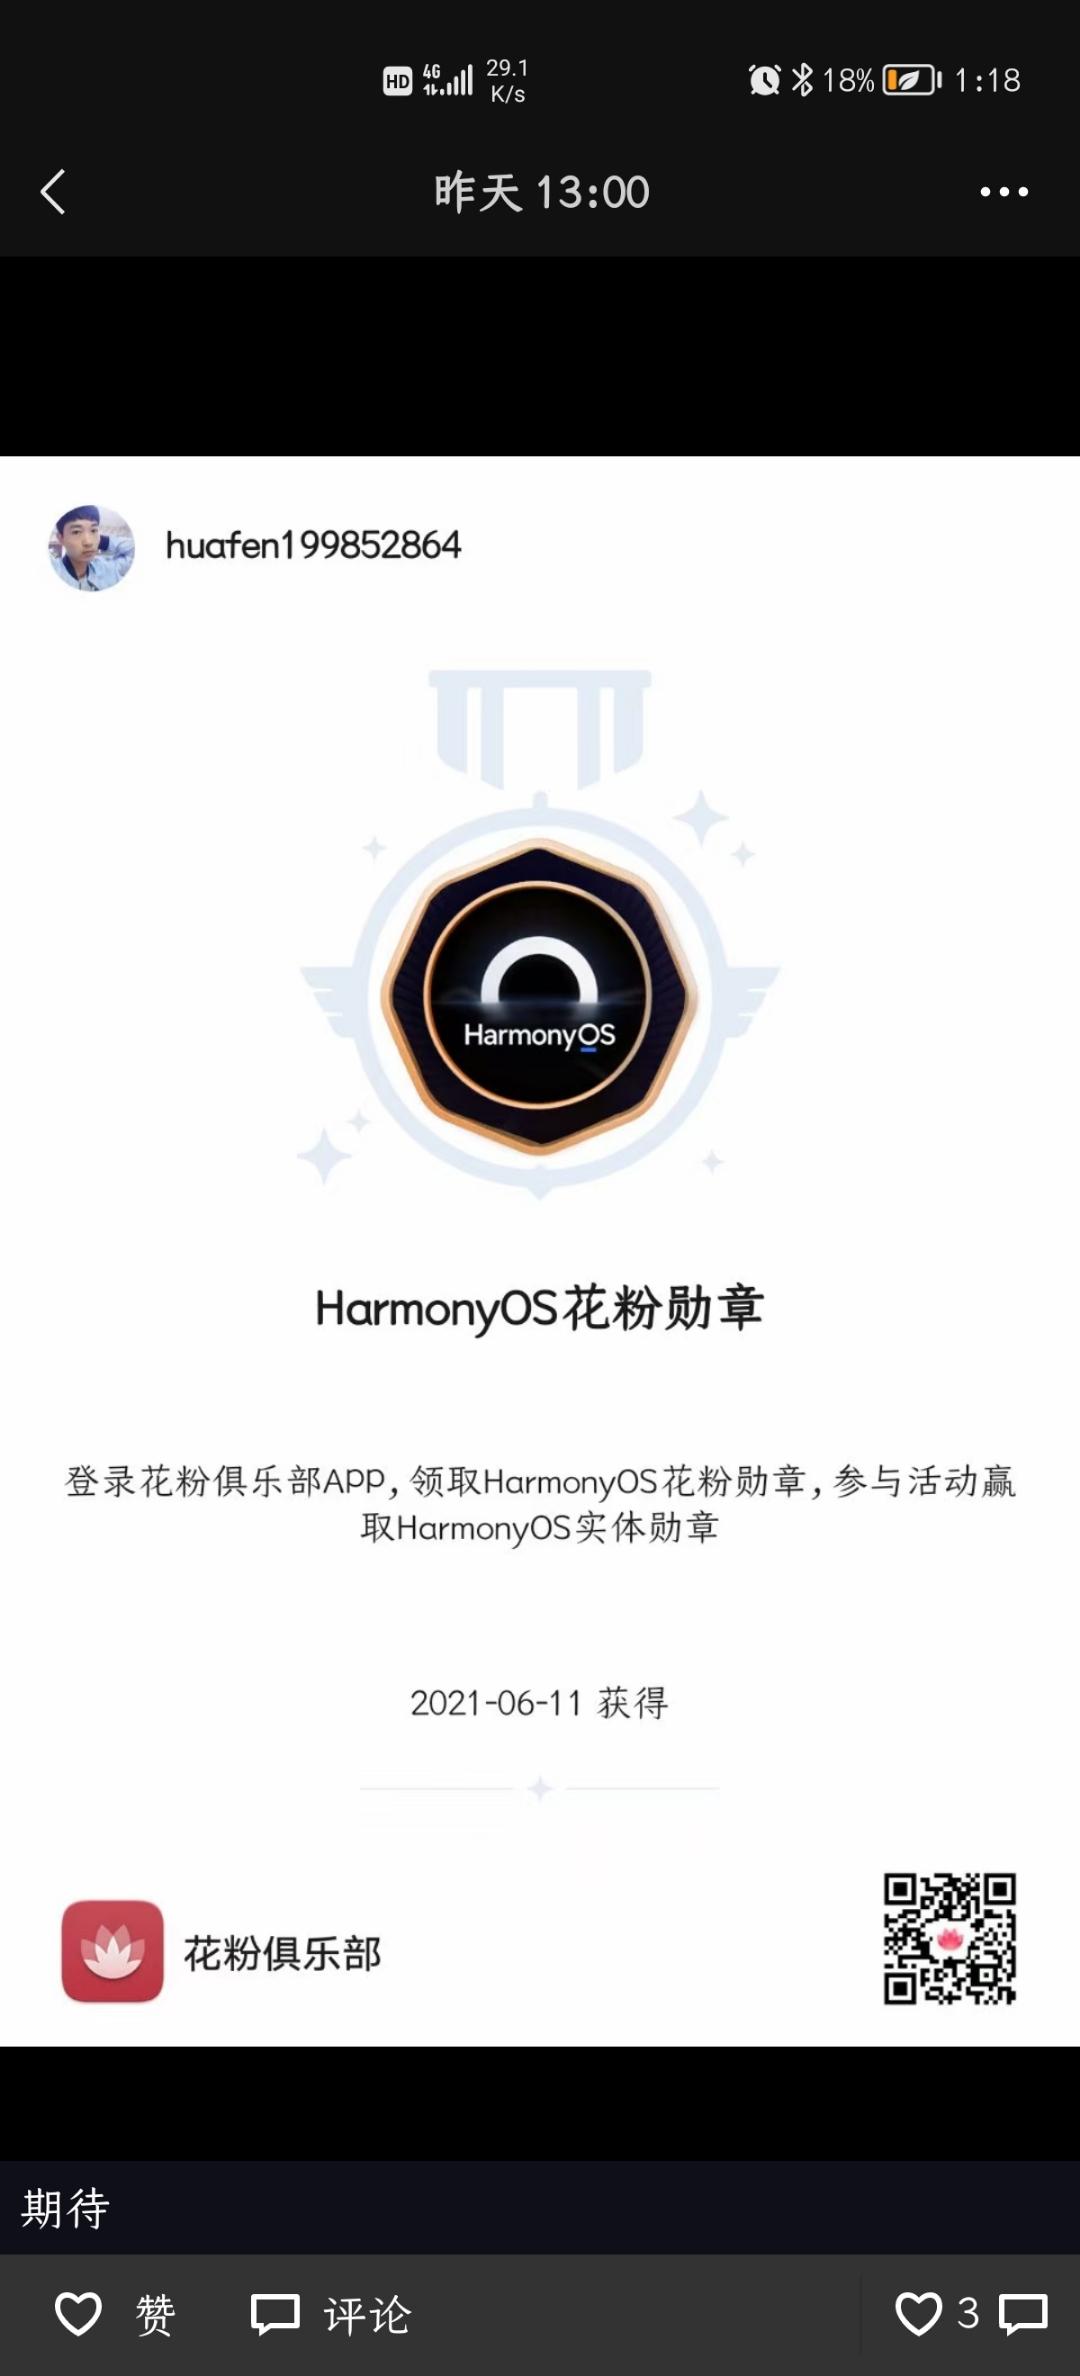 Screenshot_20210612_011851_com.tencent.mm.jpg